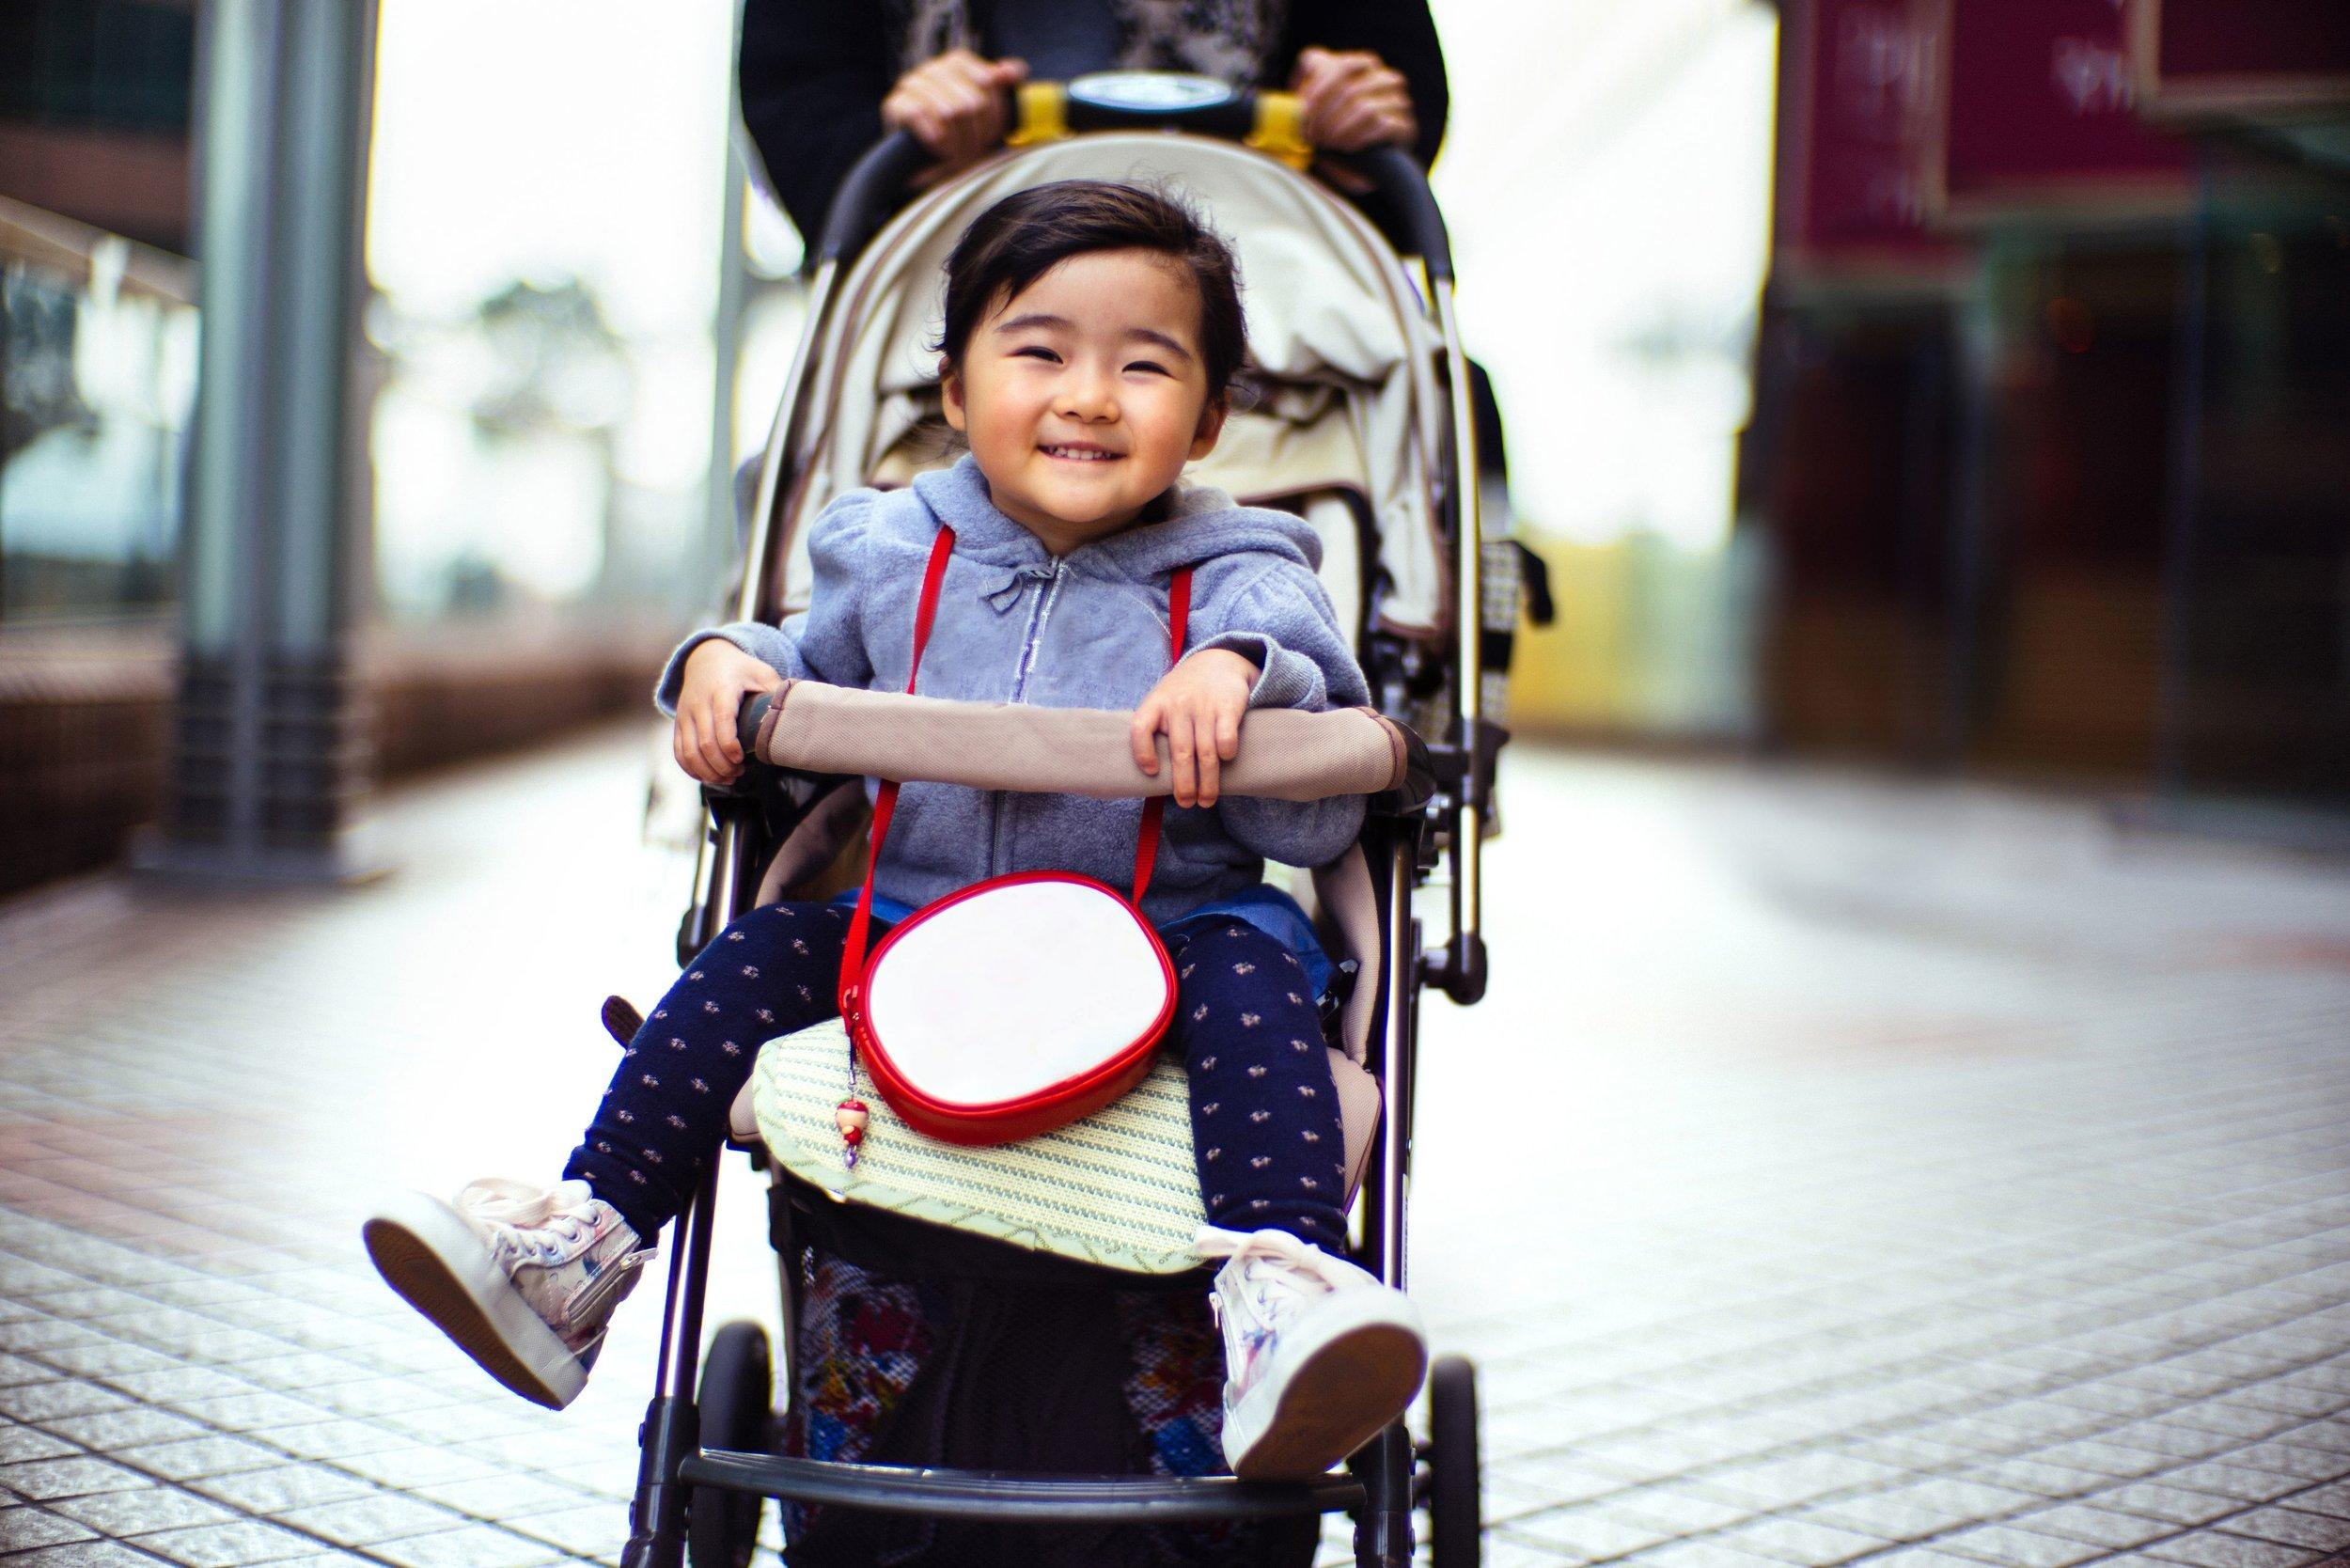 Toddler in Stroller.jpg